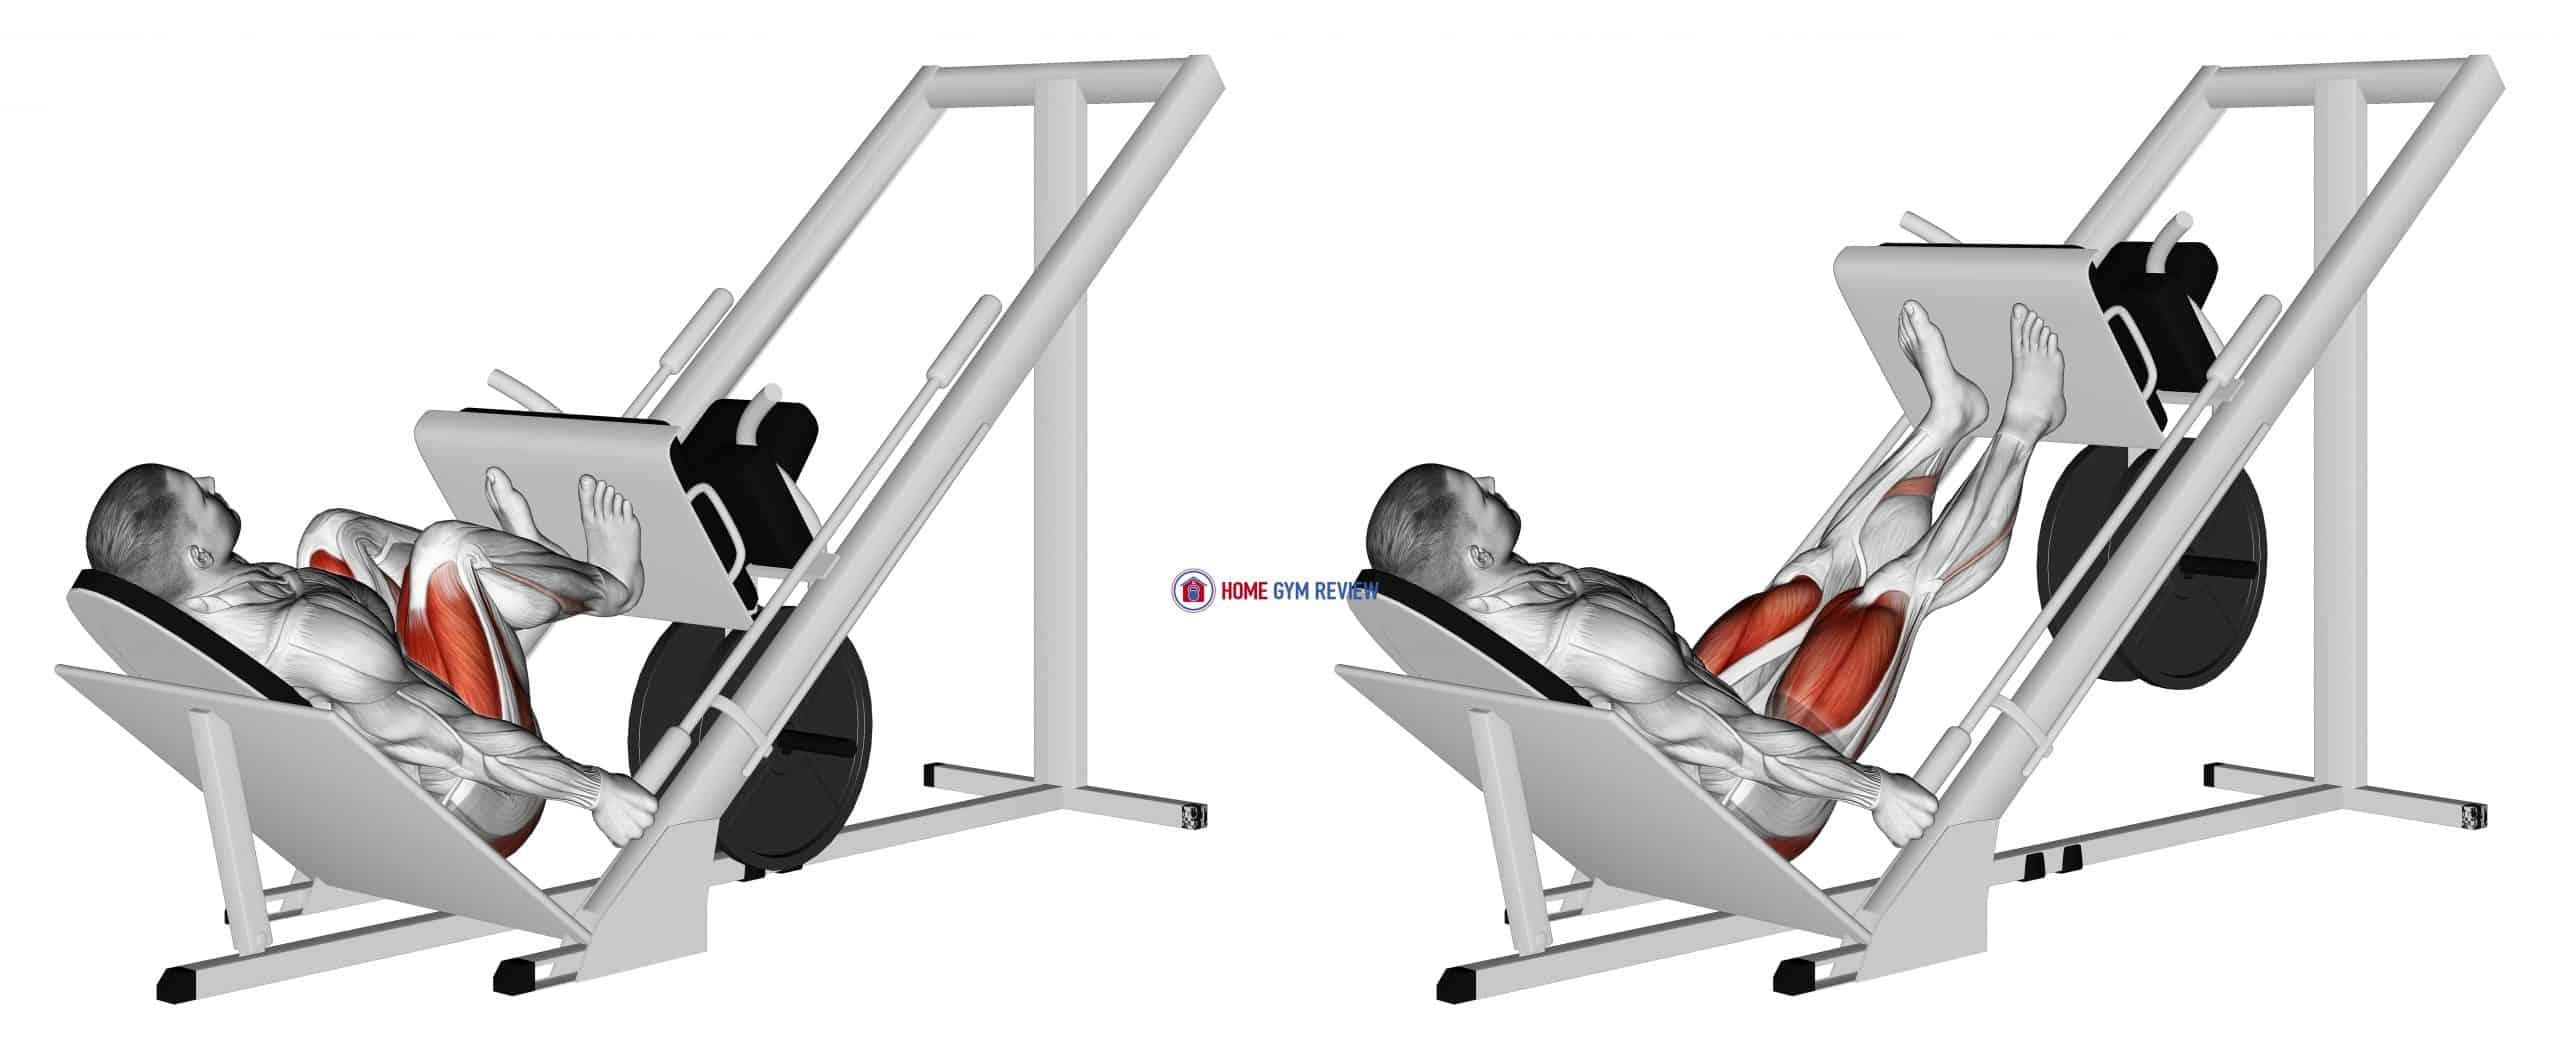 Sled 45ø Narrow Stance Leg Press